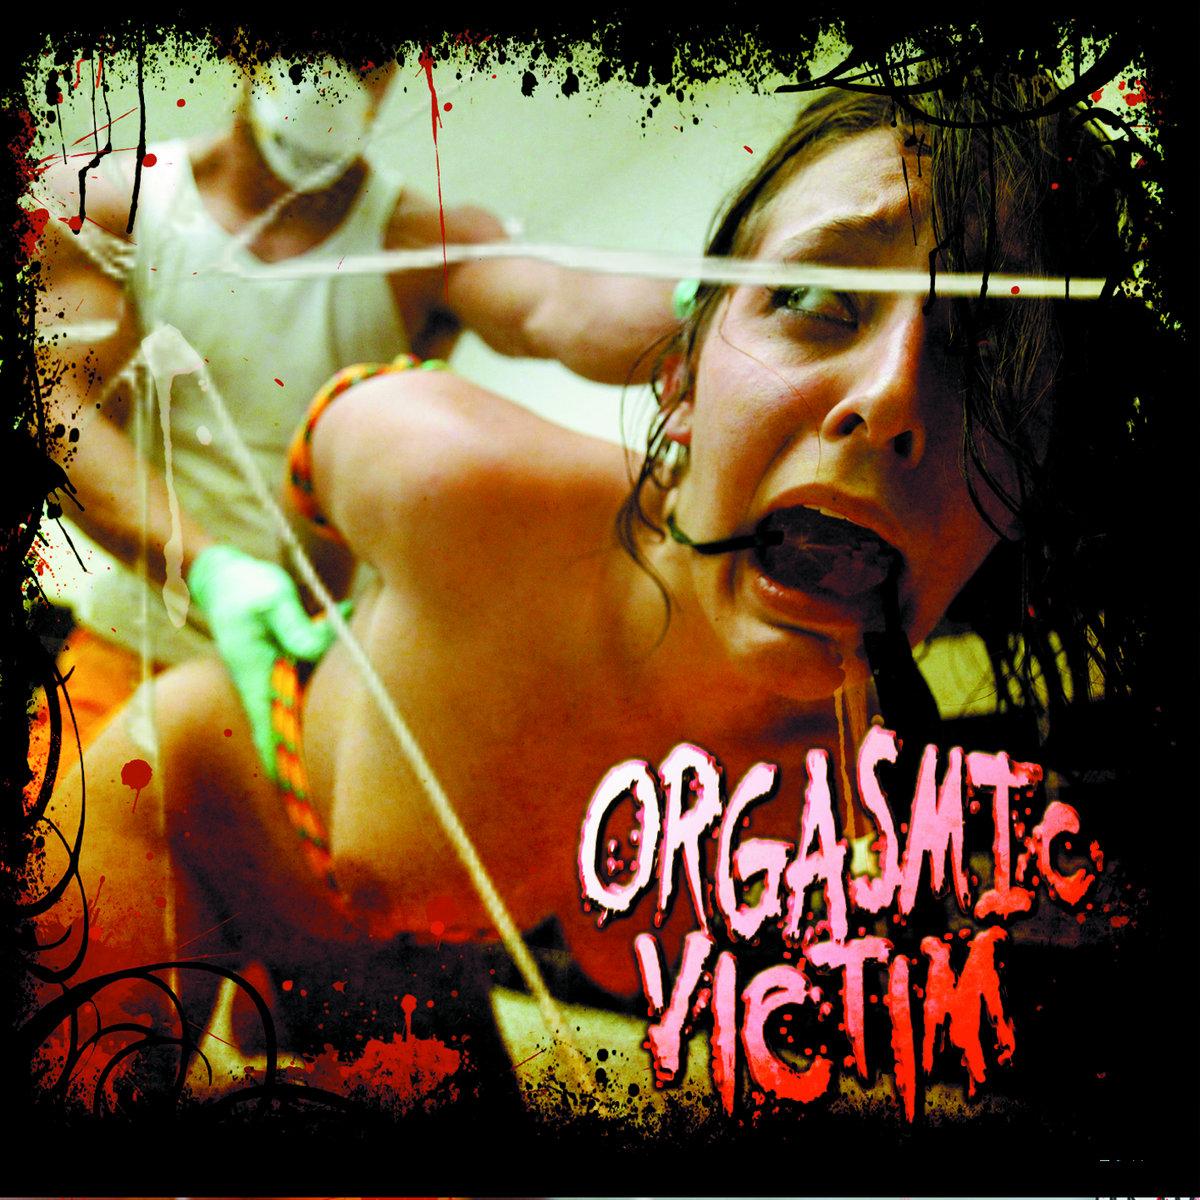 Orgasmic Victim - Orgasmic Victim (EP) (2011)